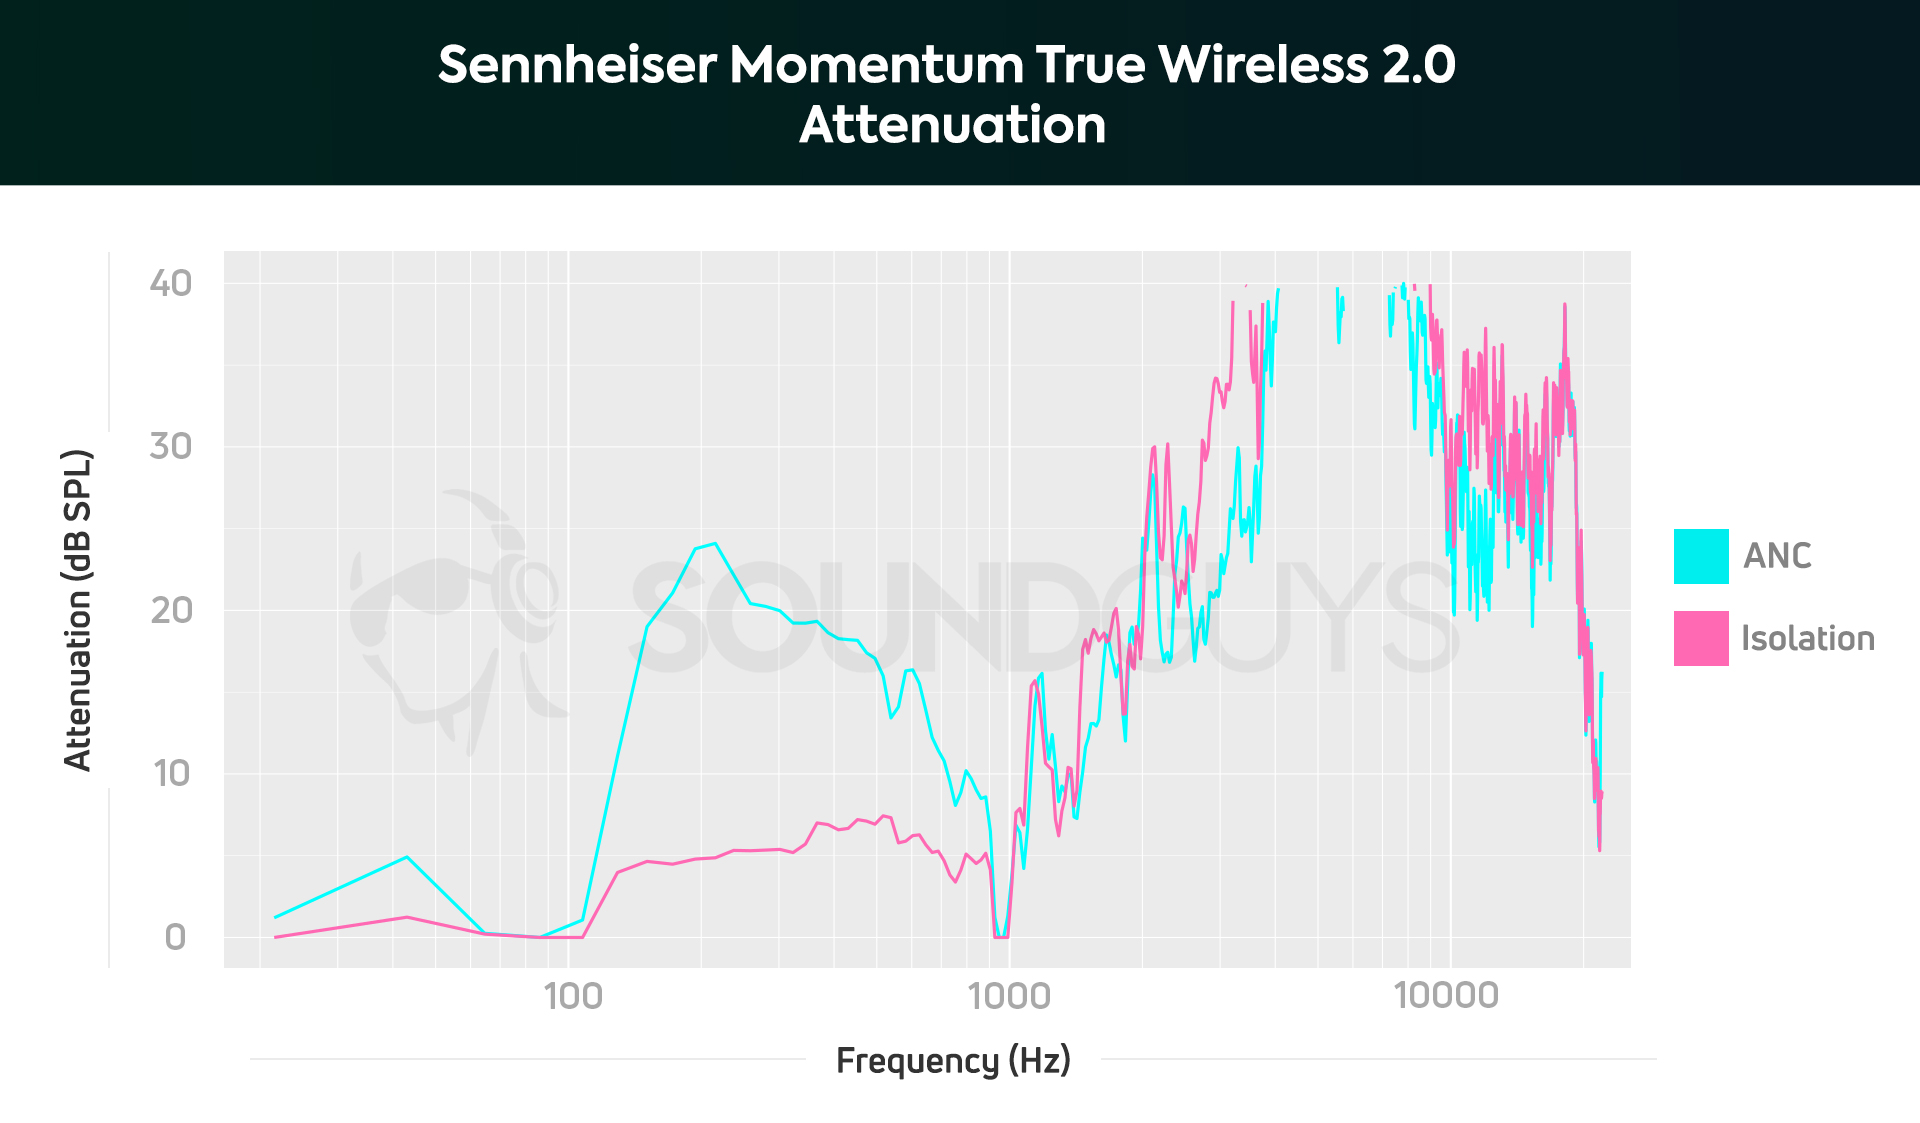 sennheiser momentum true wireless20 isolation chart 1920x1123x